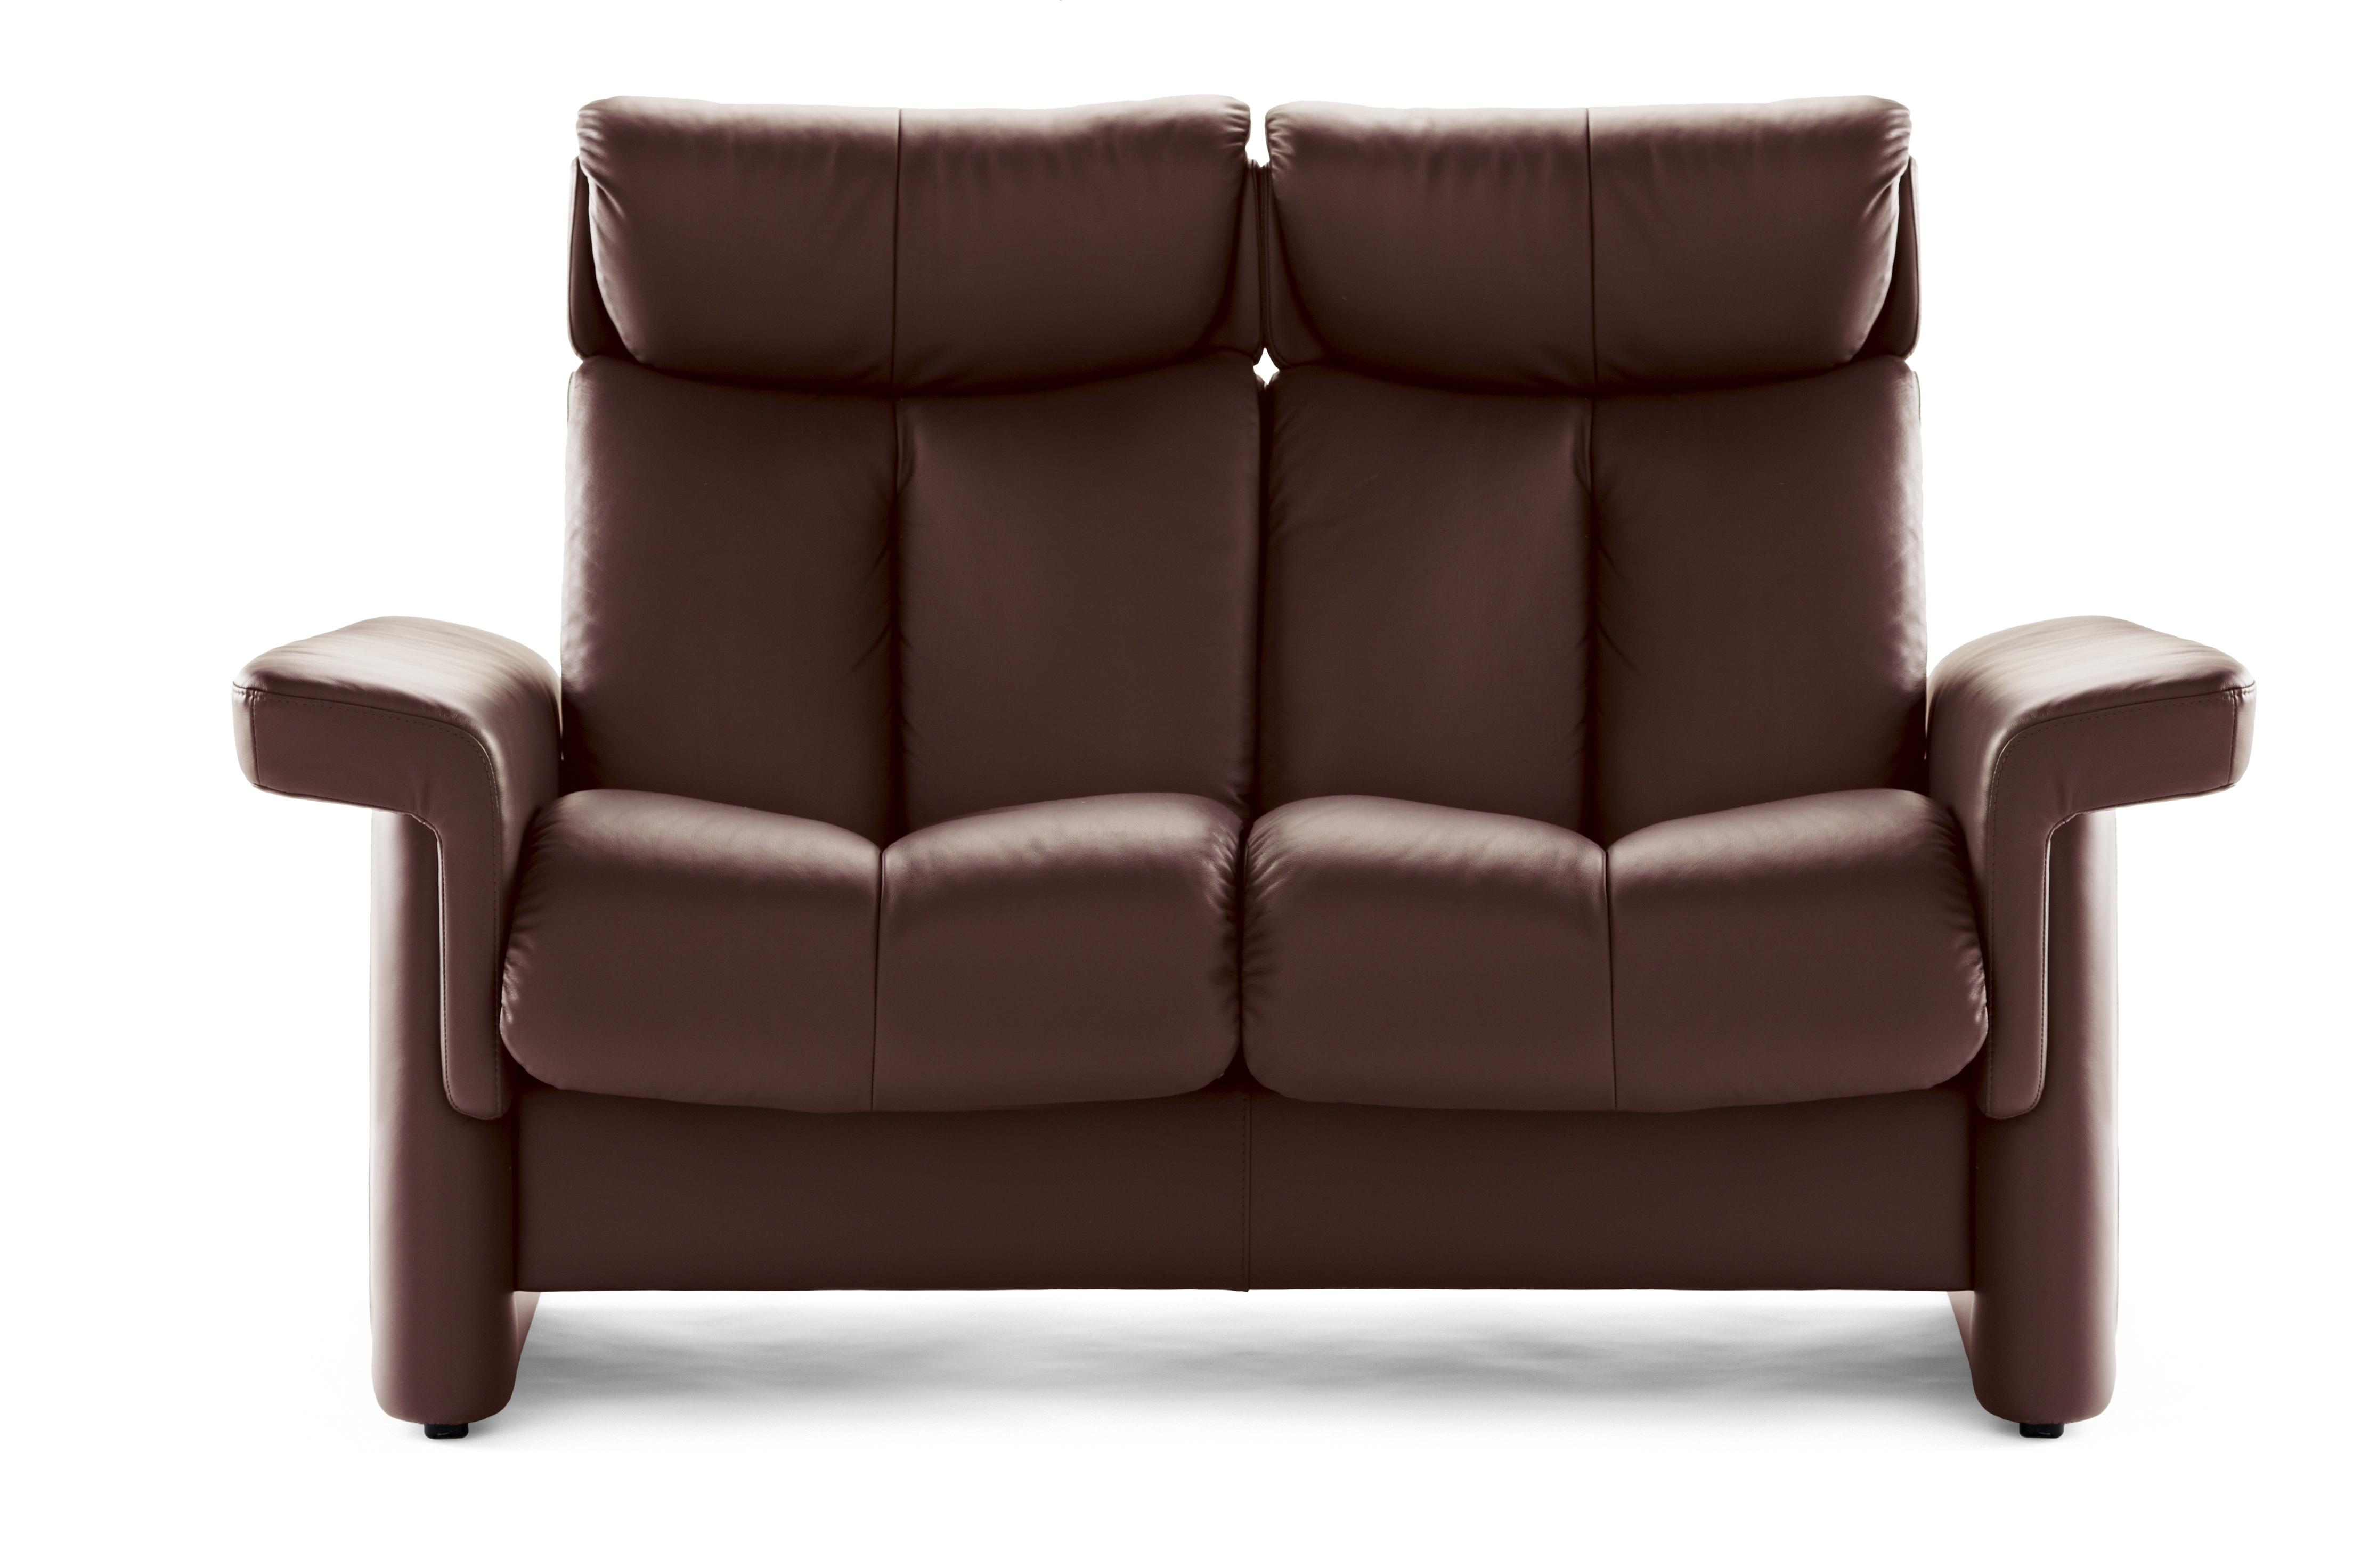 new arrivals and departures stressless and ekornes in 2015. Black Bedroom Furniture Sets. Home Design Ideas